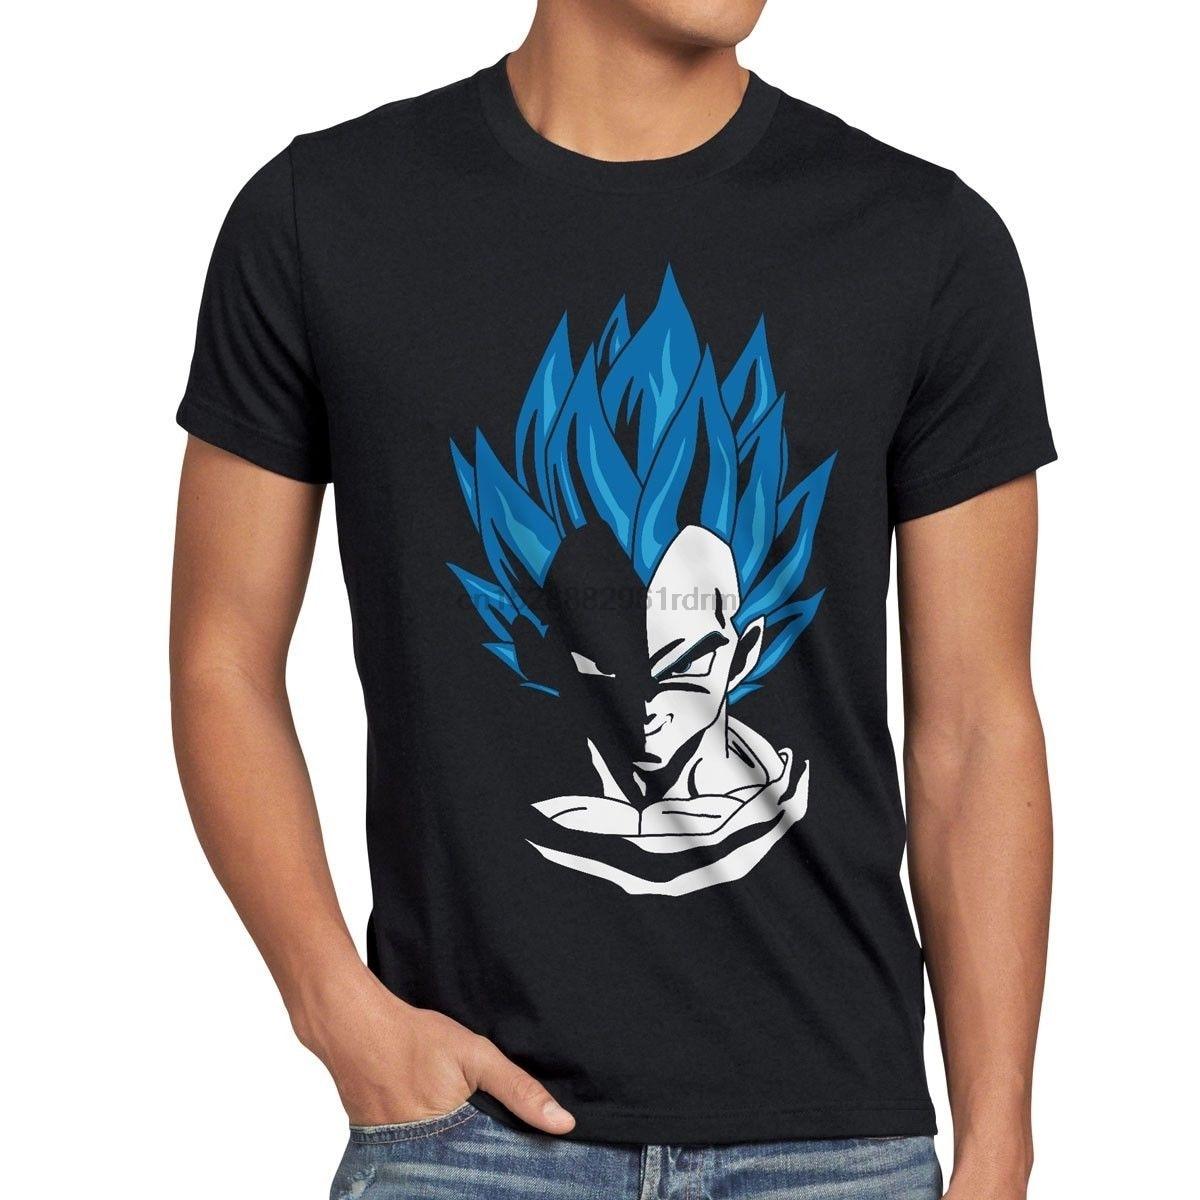 Super Vegeta Herren camiseta hijo de goku evolución fitness deporte dragón roshi 2019 moda t camisa 100% algodón camiseta